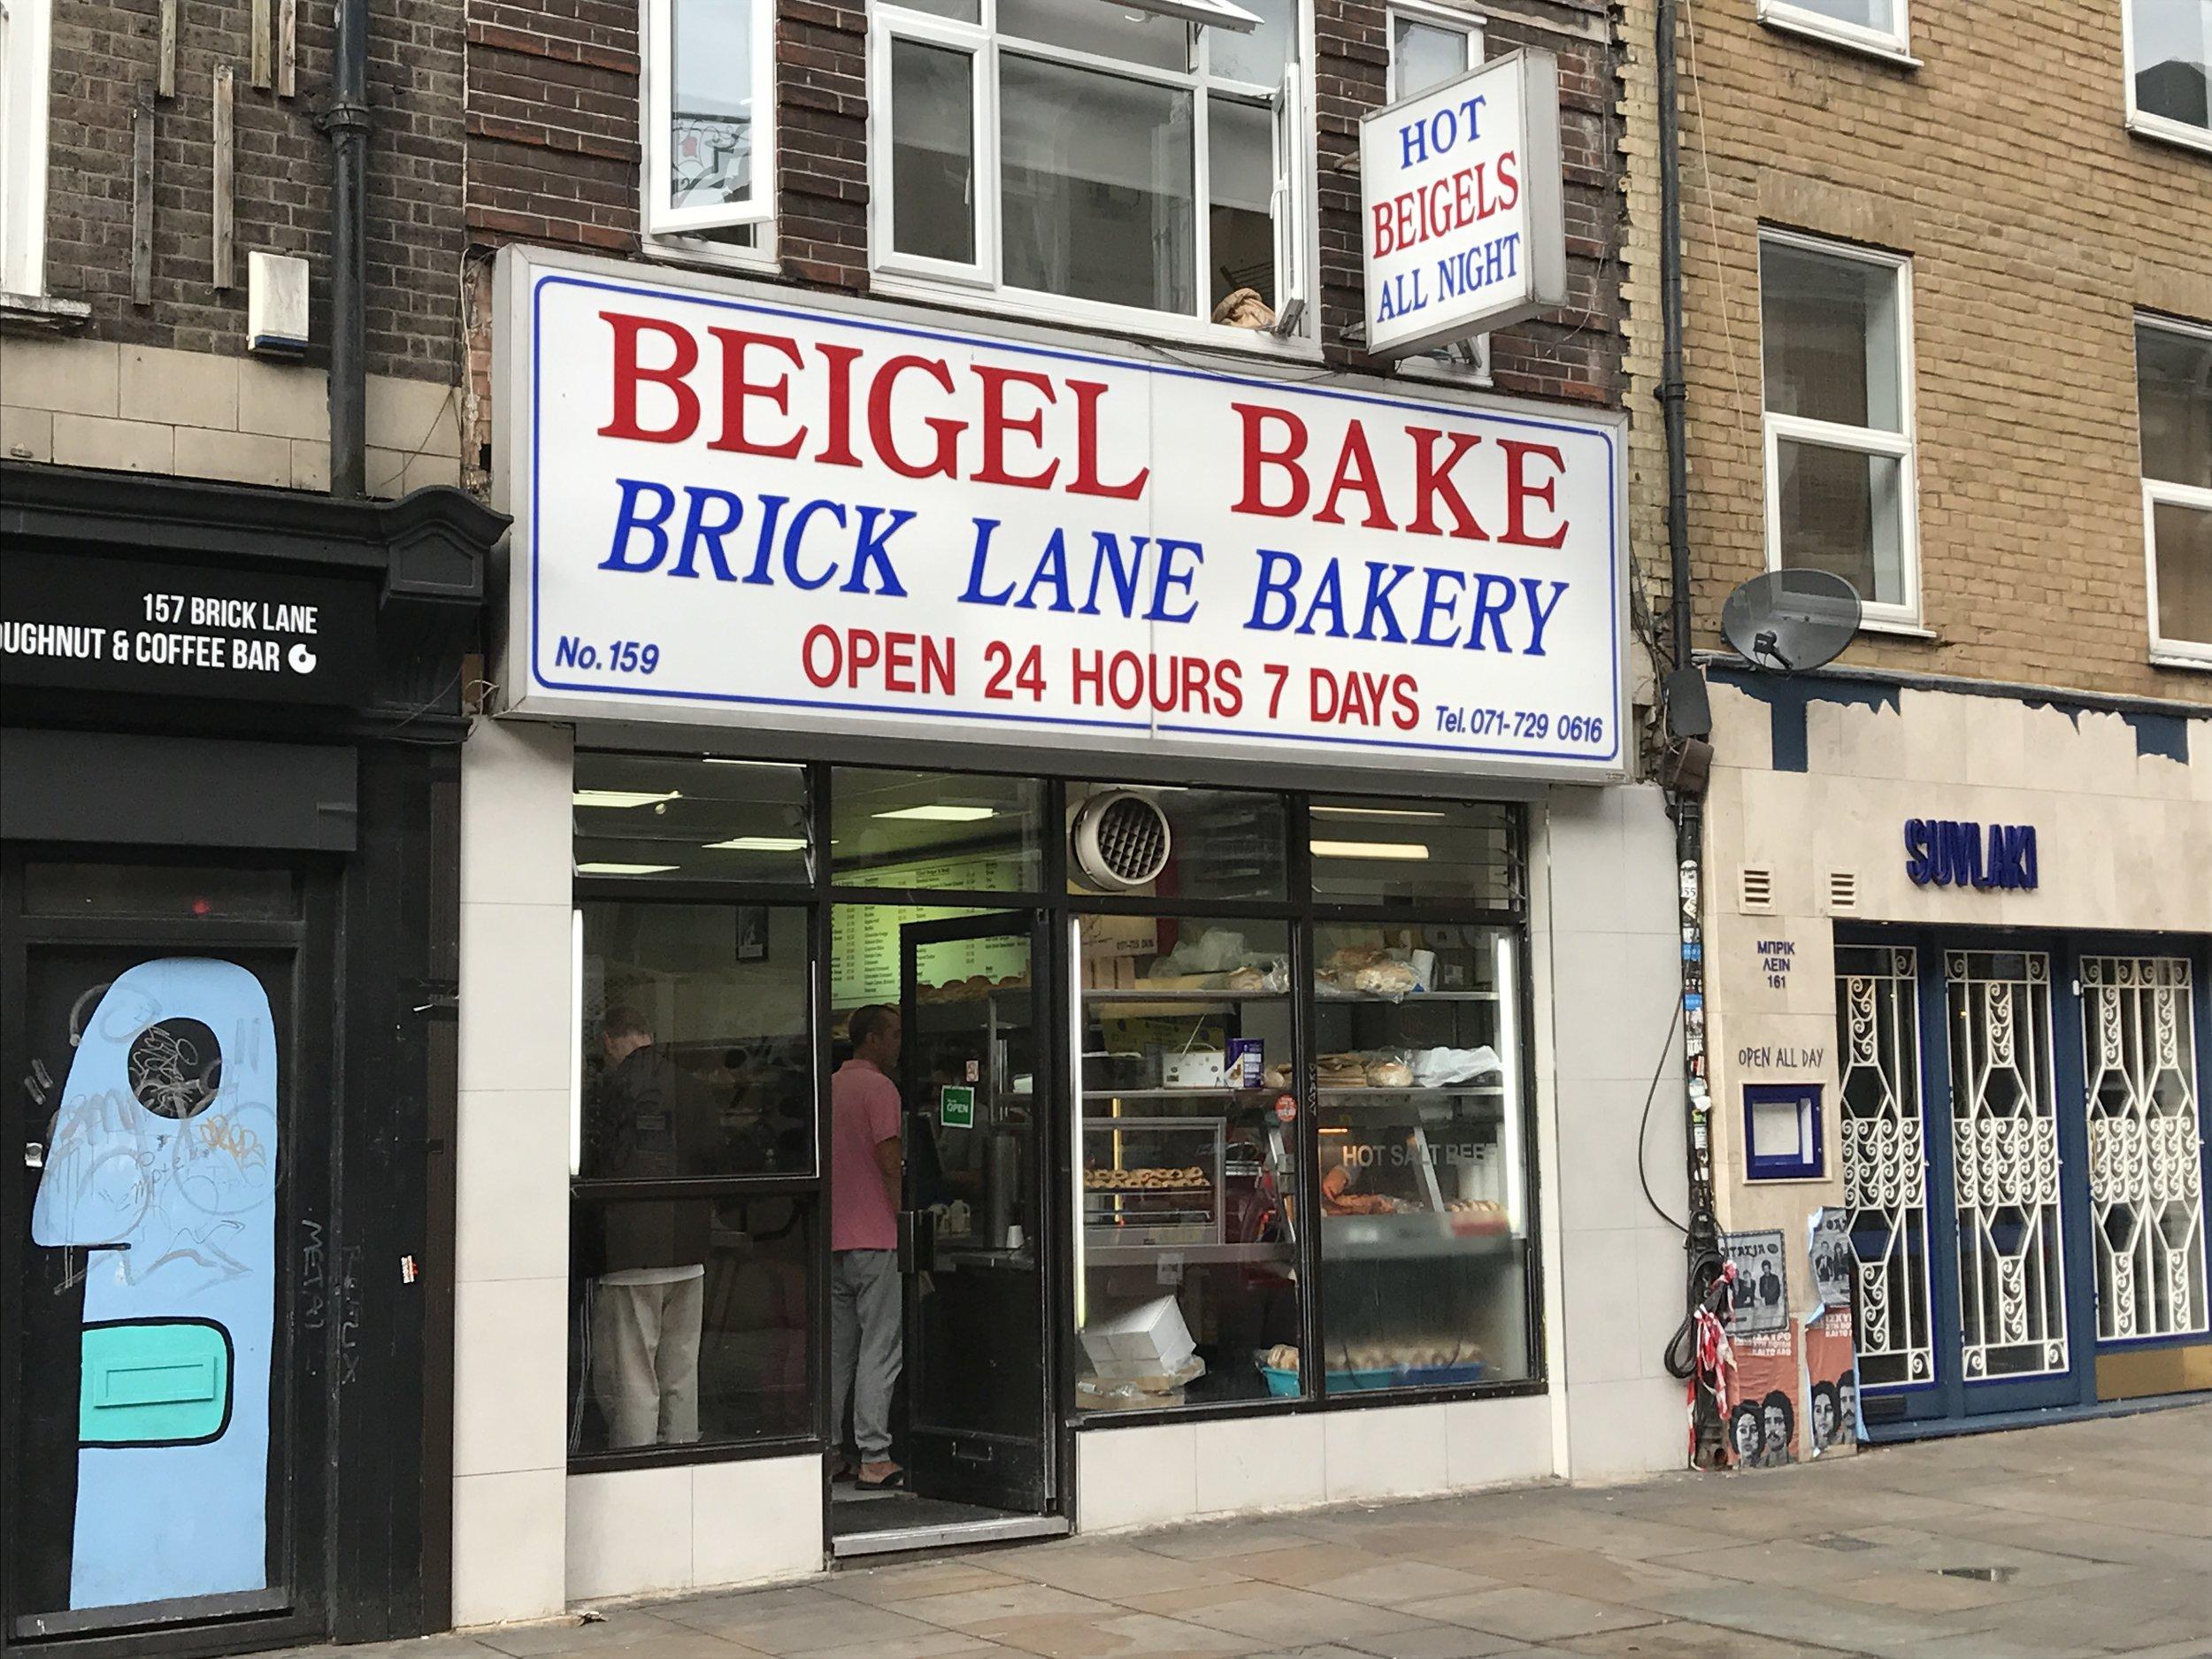 Beigel-Bake-Brick-Lane-London